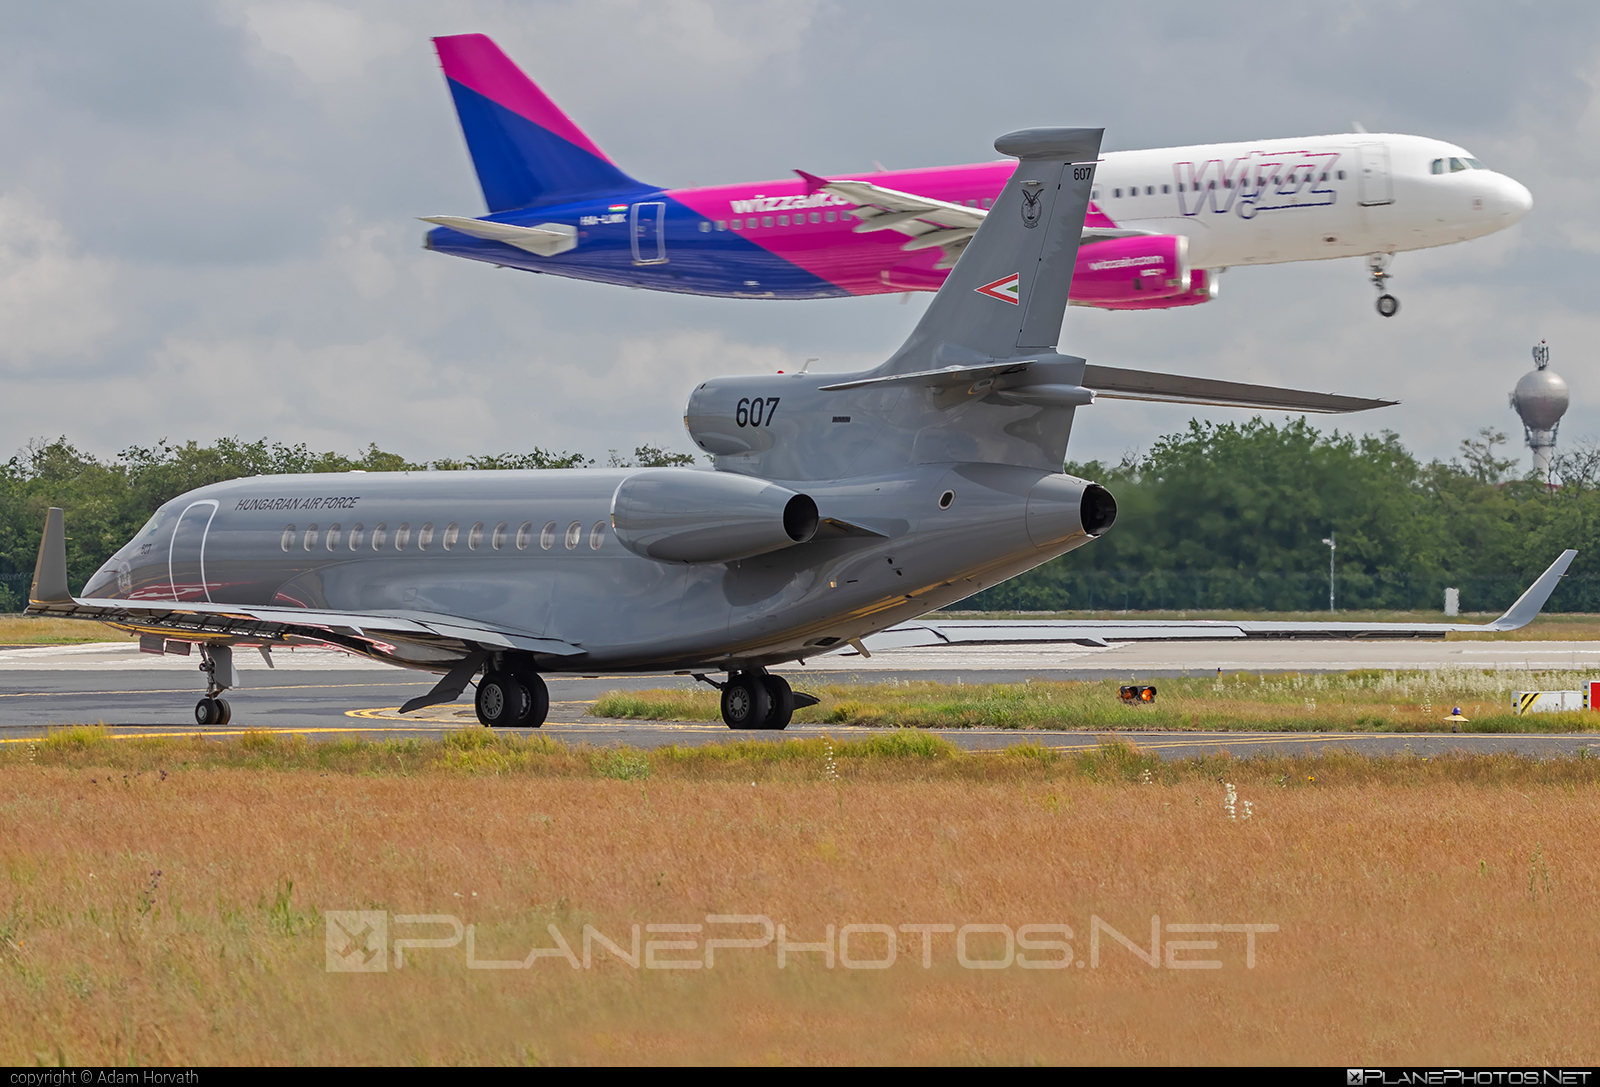 Dassault Falcon 7X - 607 operated by Magyar Légierő (Hungarian Air Force) #dassault #dassaultfalcon #dassaultfalcon7x #falcon7x #hungarianairforce #magyarlegiero